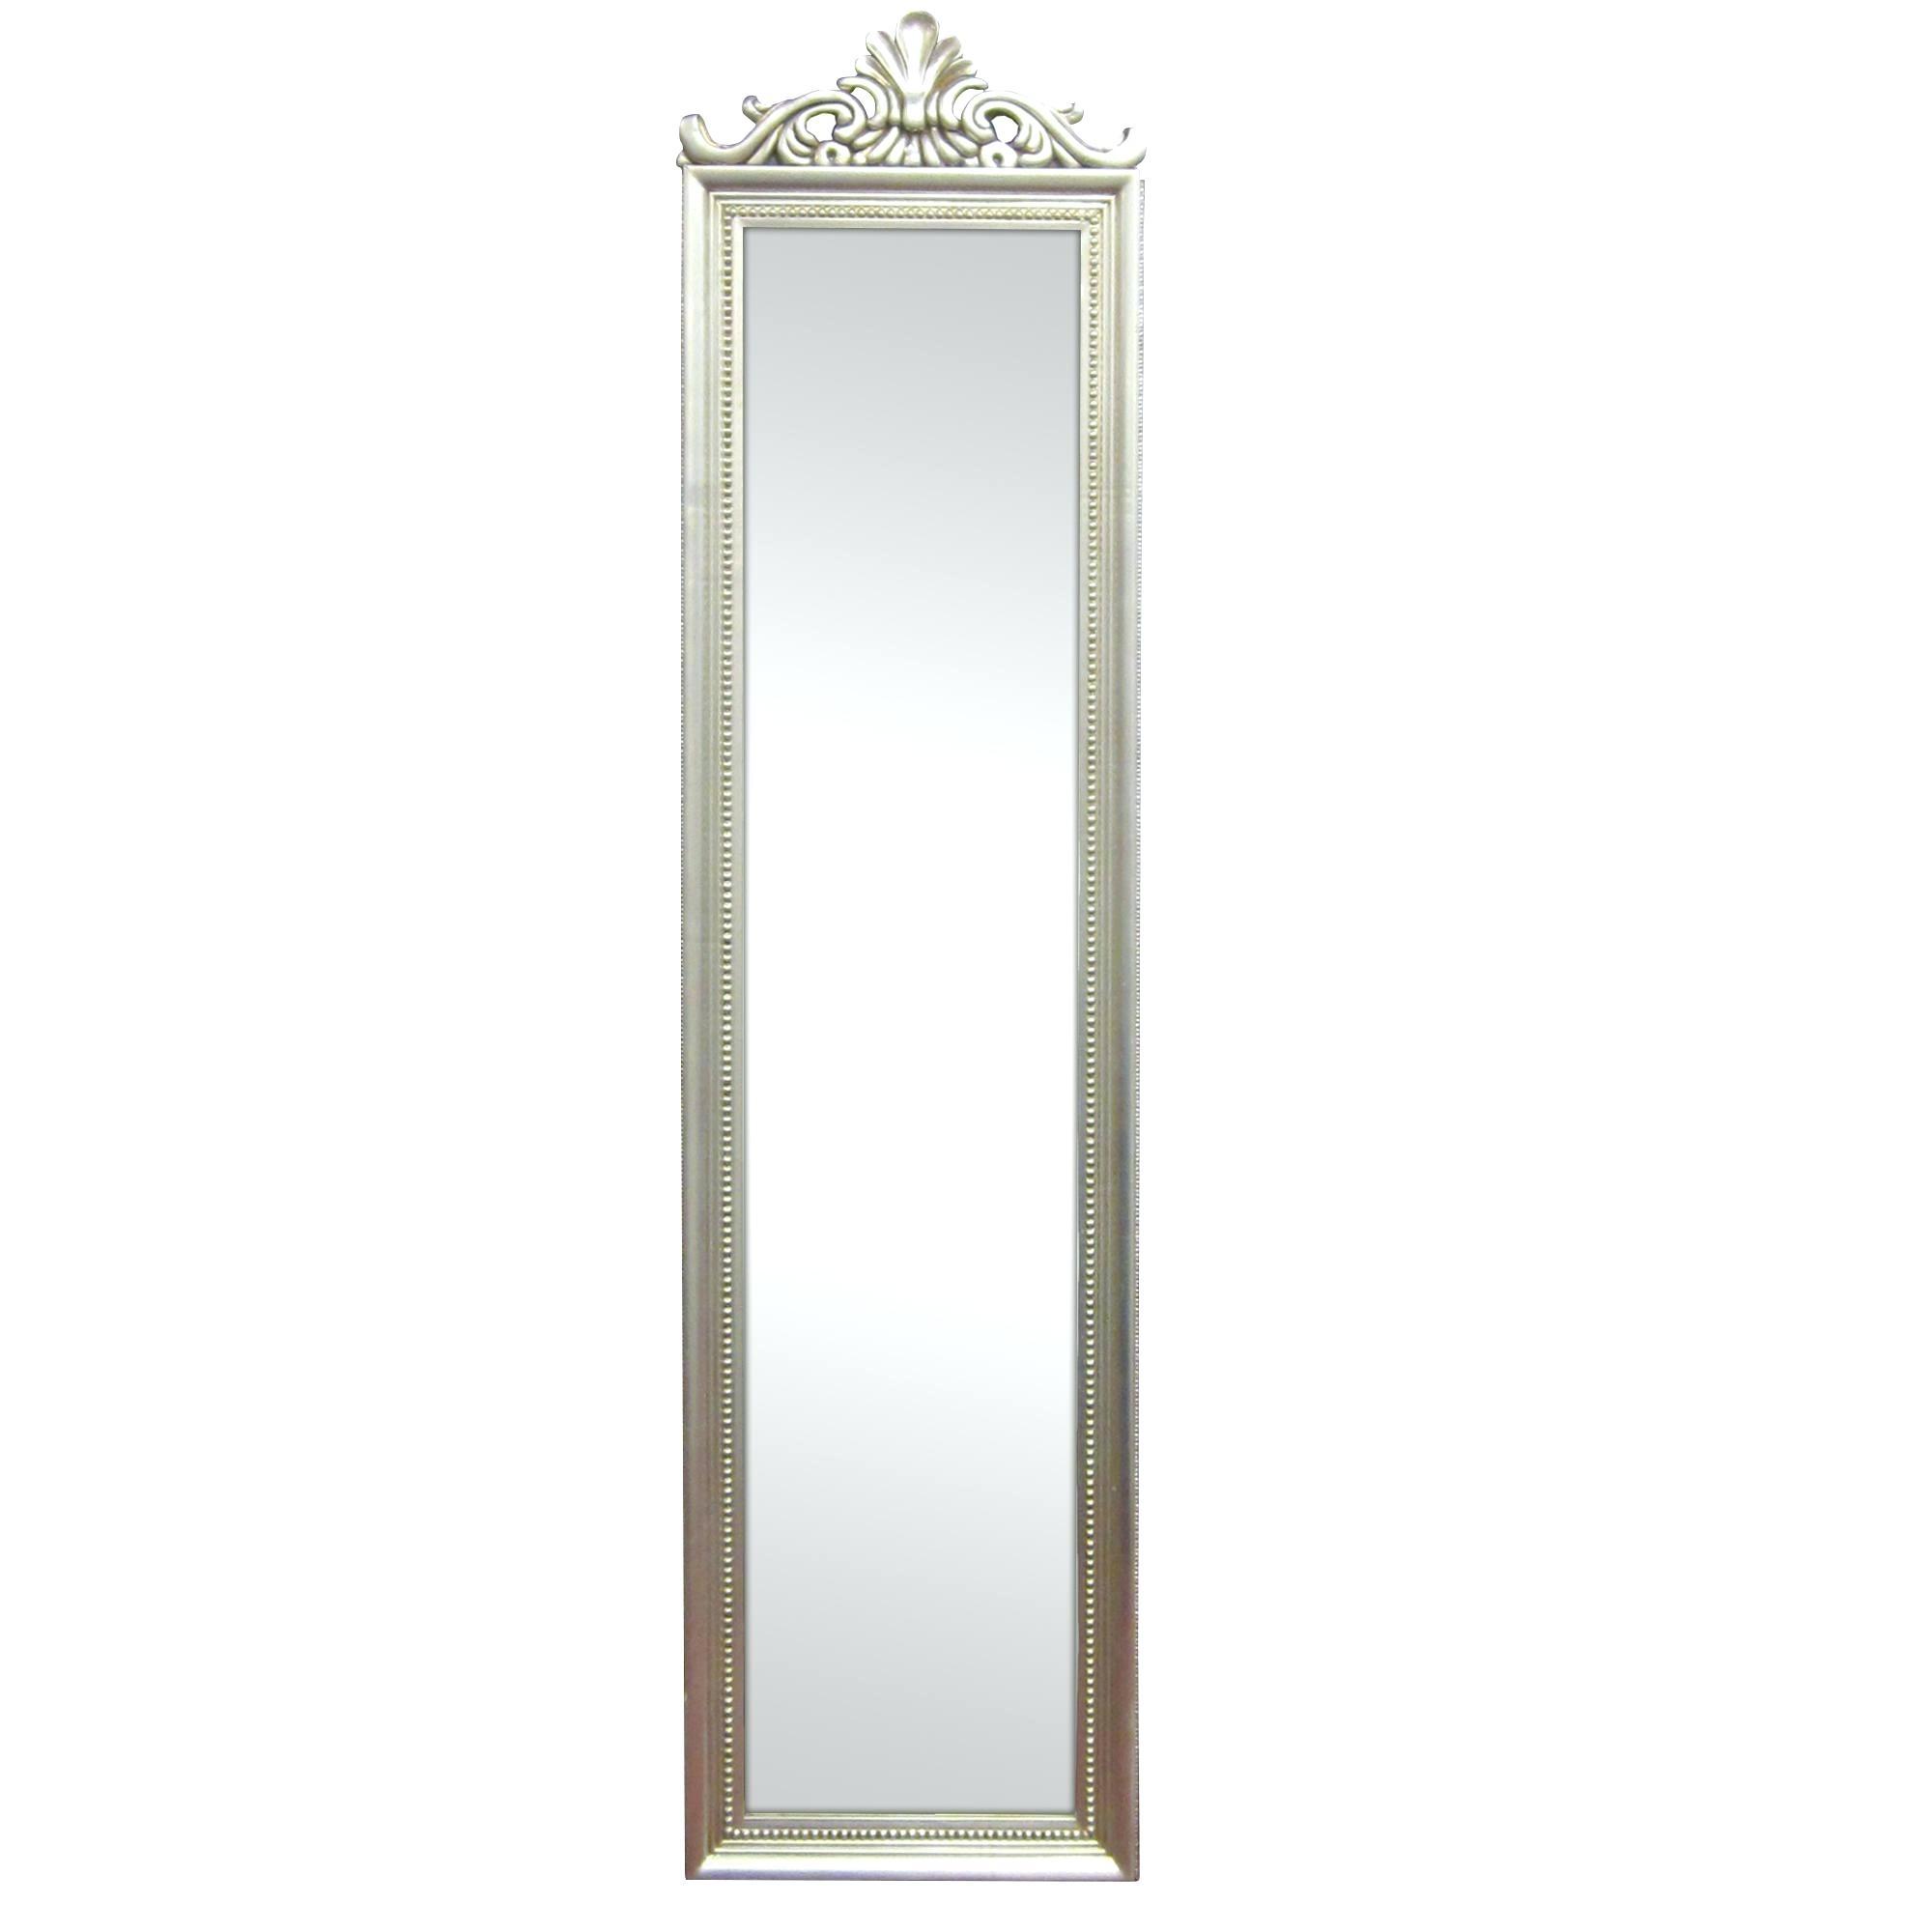 15 Ornate Full Length Wall Mirror